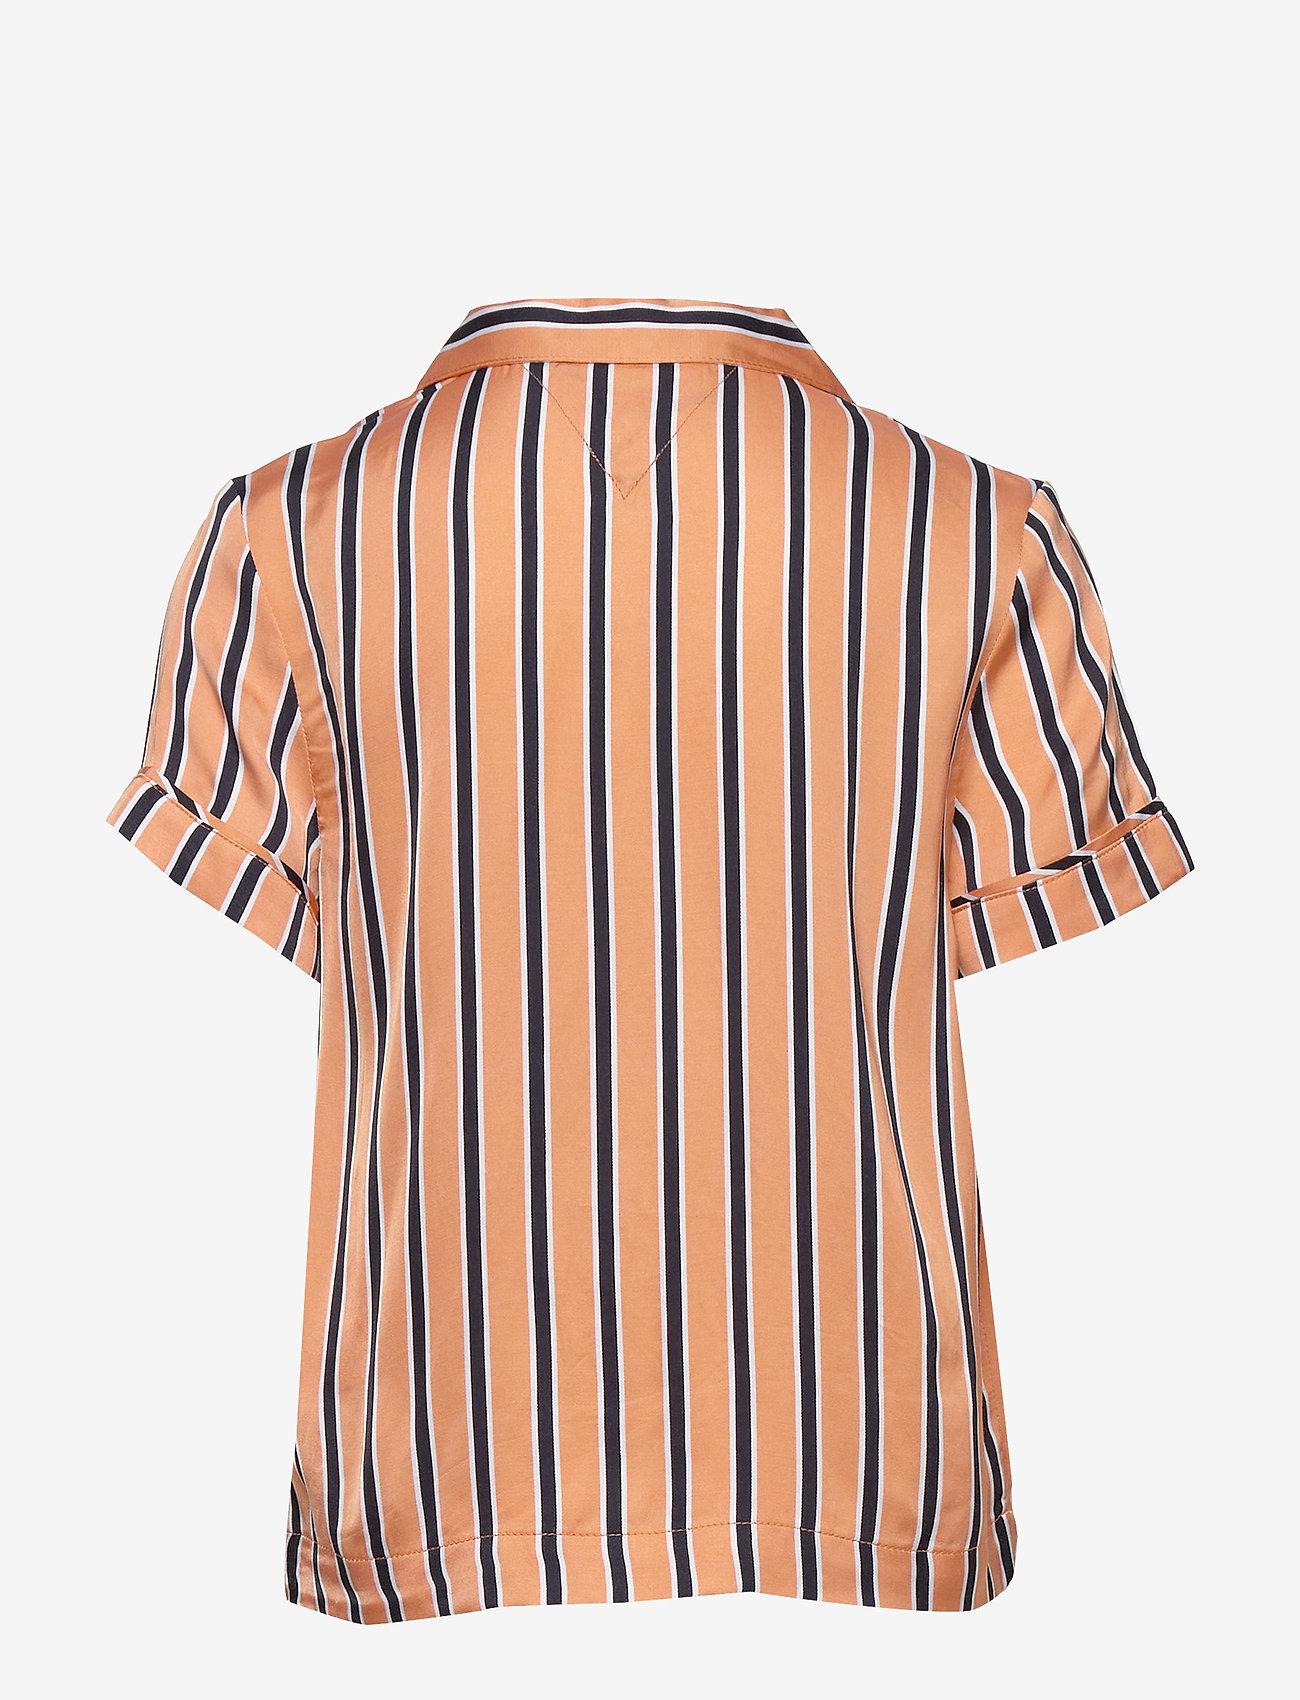 Tommy Hilfiger - RESORT STRIPE SHIRT S/S - shirts - melon orange/ twilight navy - 1